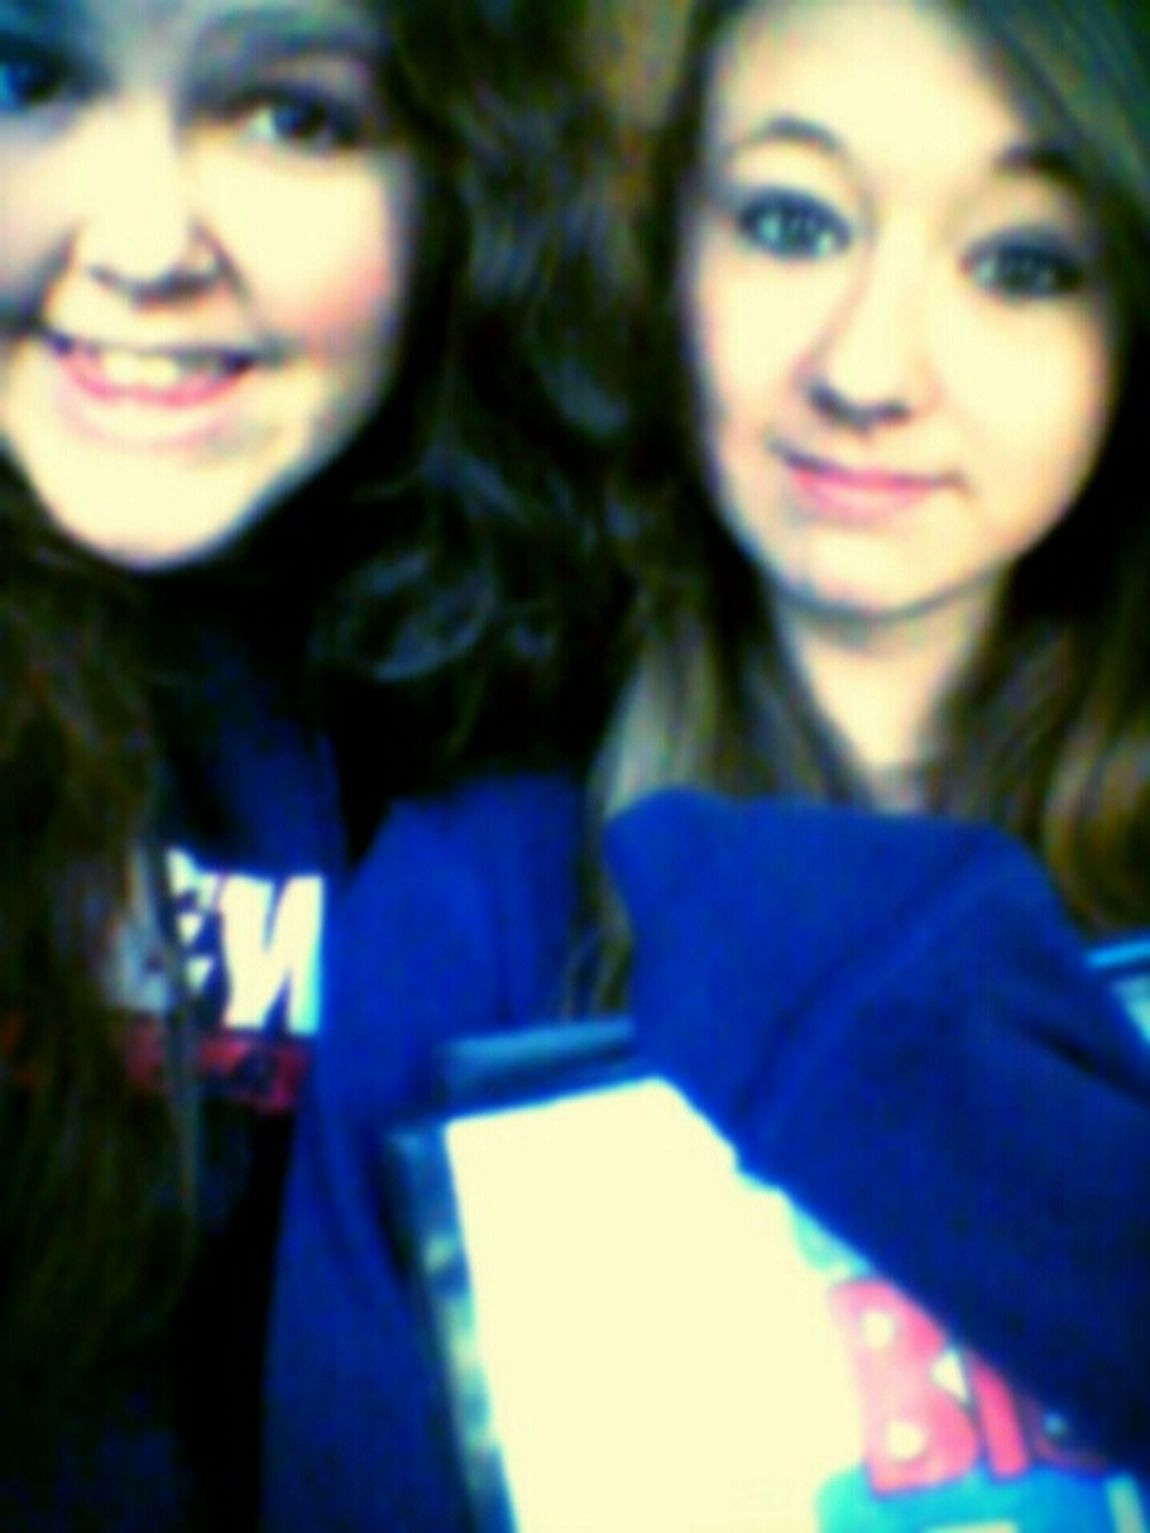 We Cutee (;